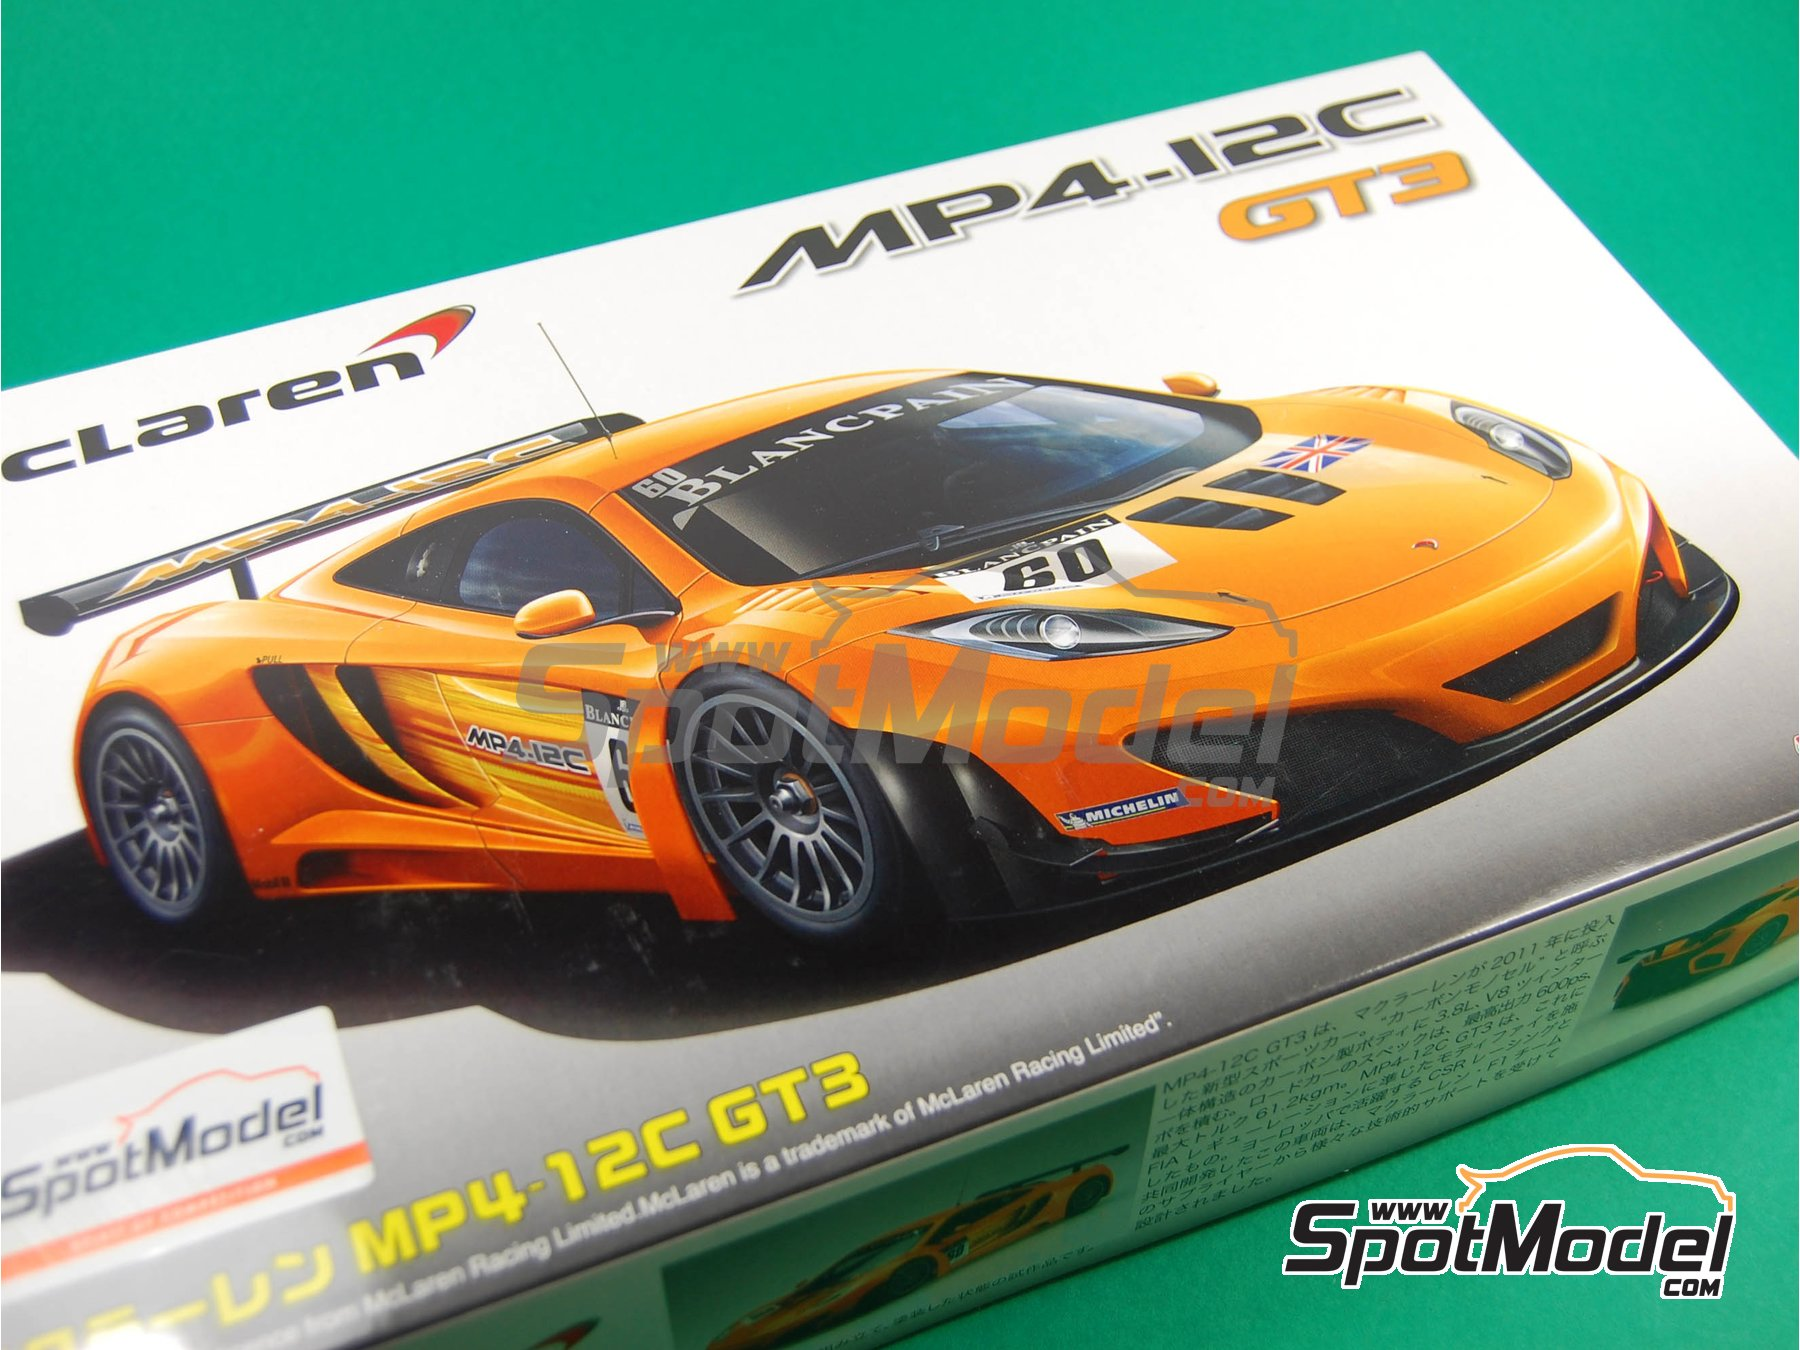 Fujimi: Model car kit 1/24 scale McLaren MP4-12C GT3 Blancpain #60 ...